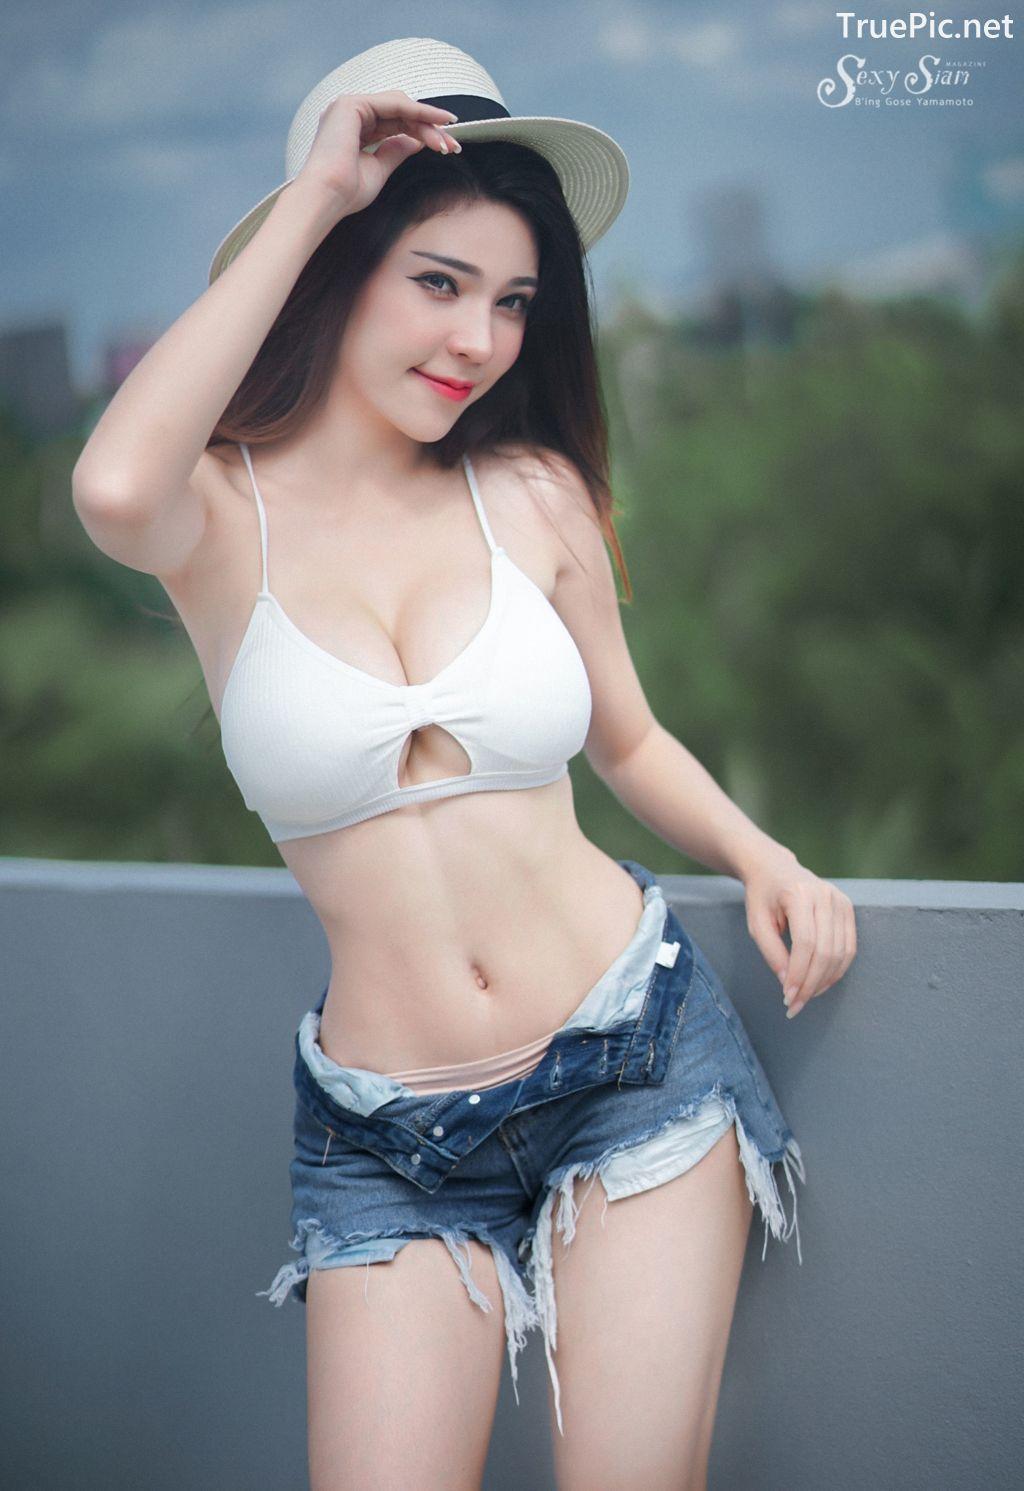 Image-Thailand Sexy Model-Janet-Kanokwan-Saesim-White-Bra-And-Jean-TruePic.net- Picture-5